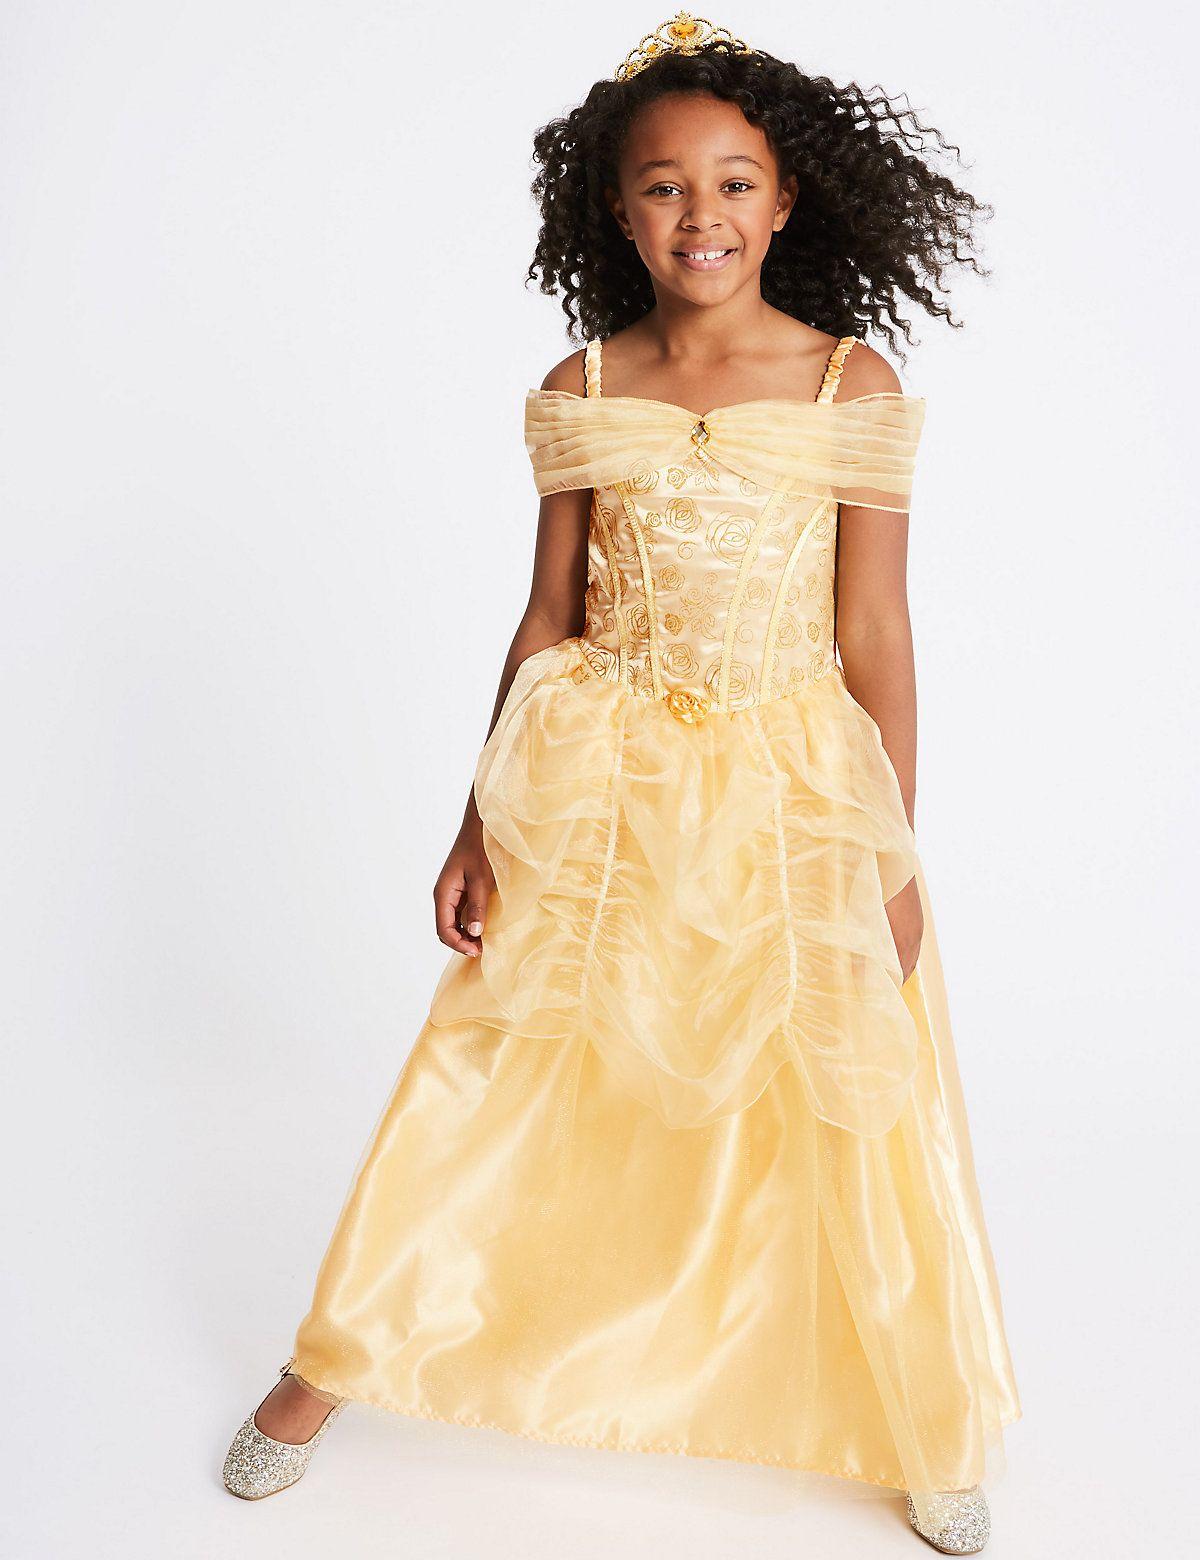 Princess Belle Disney Costume